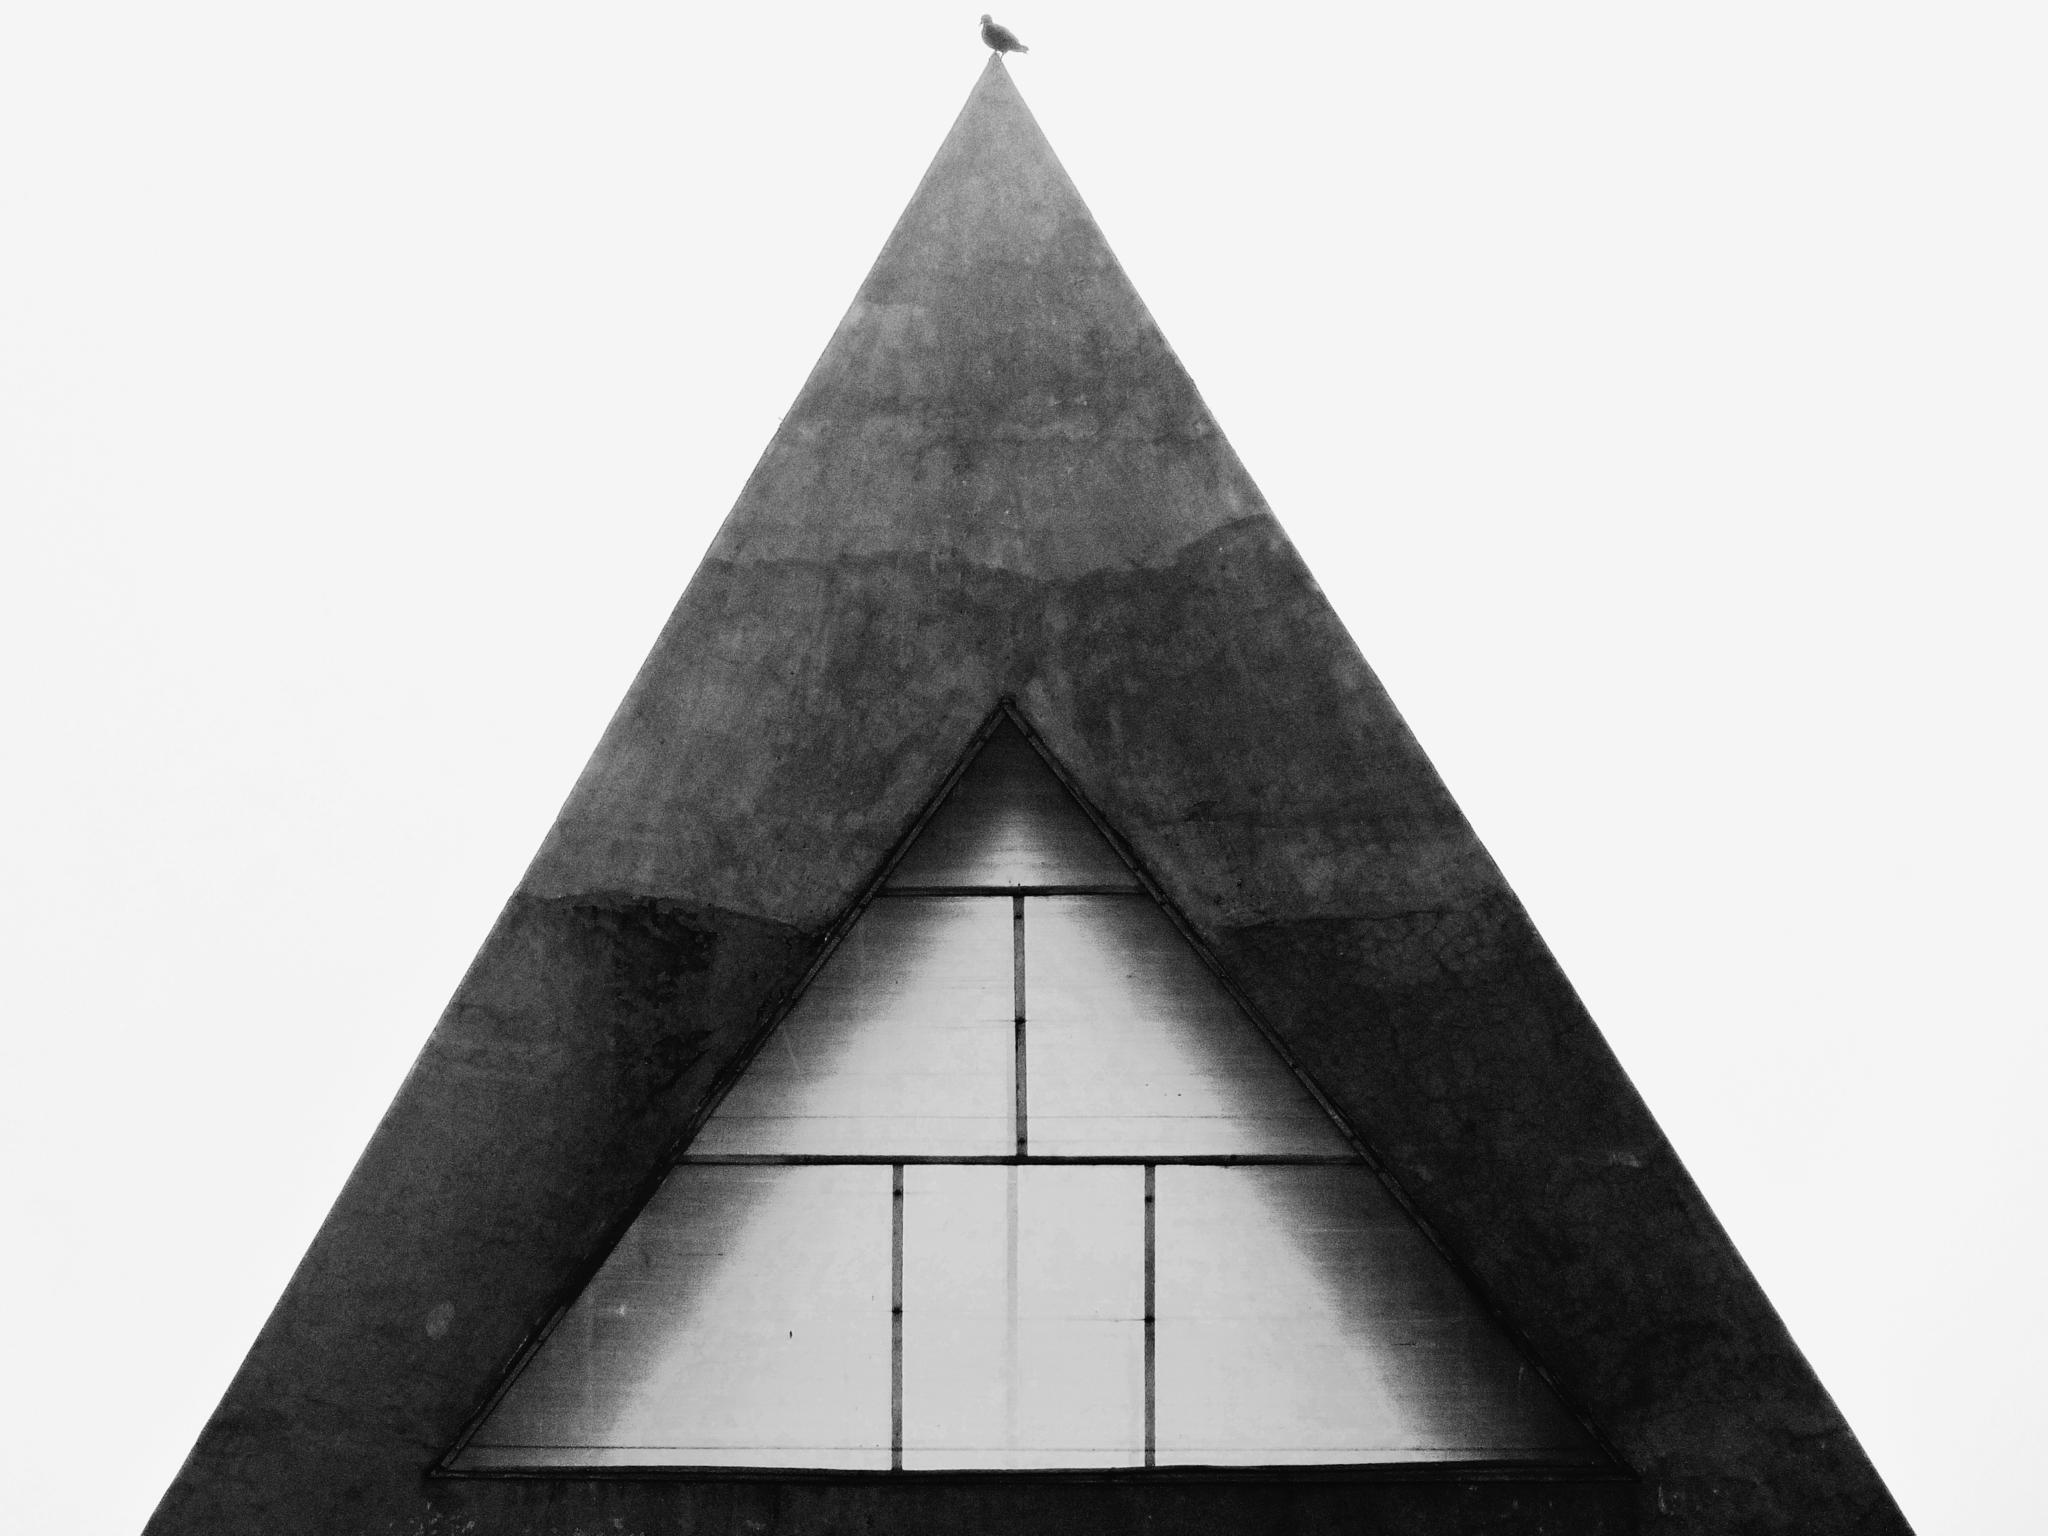 Geometry by Shreyans S Shah